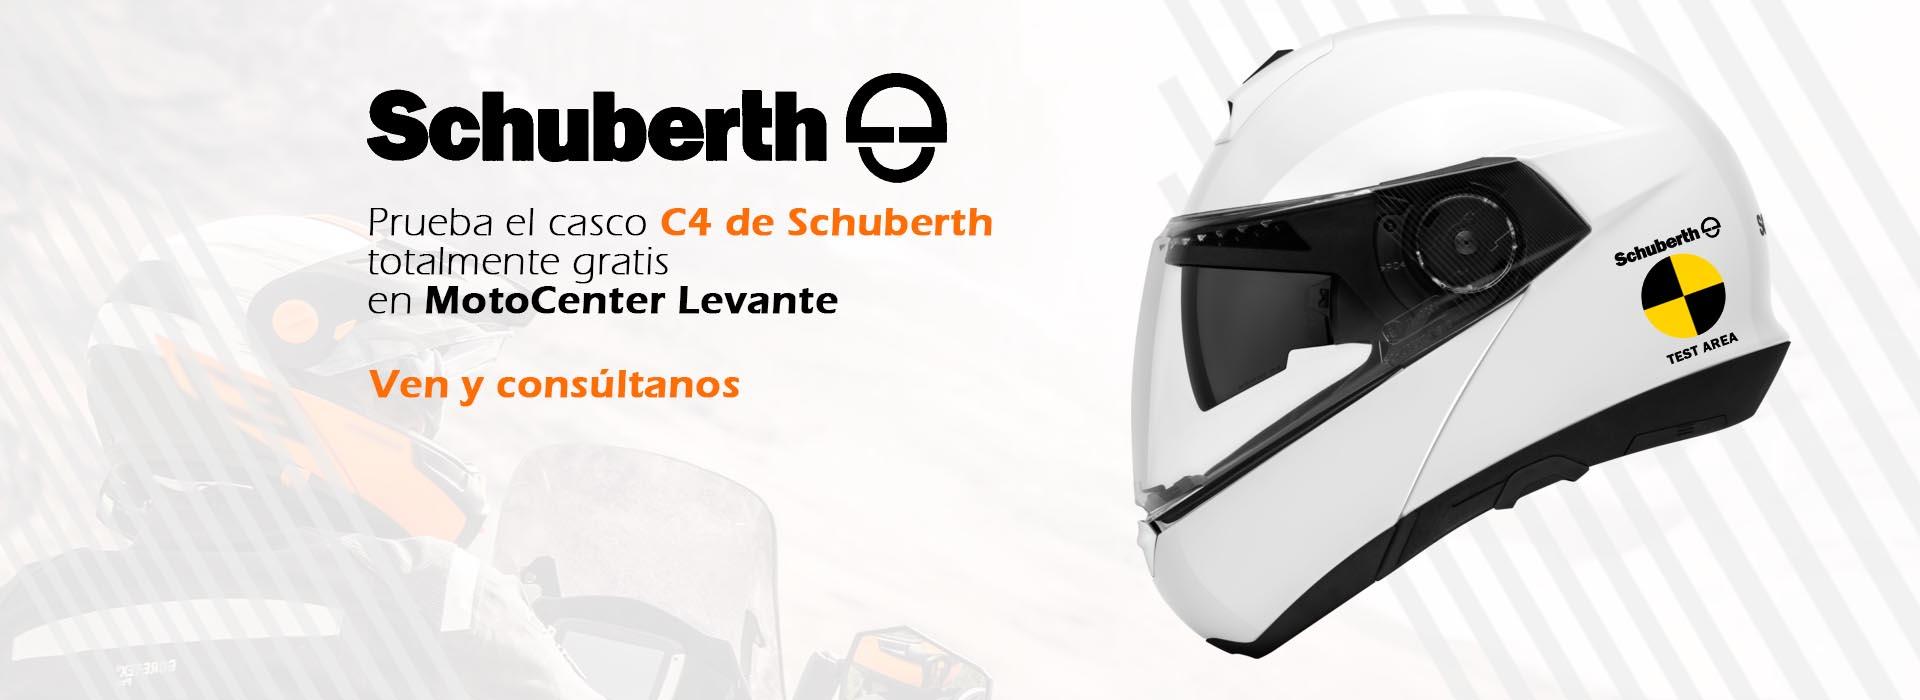 prueba gratis el casco schuberth c4 en motocenter levante. Black Bedroom Furniture Sets. Home Design Ideas